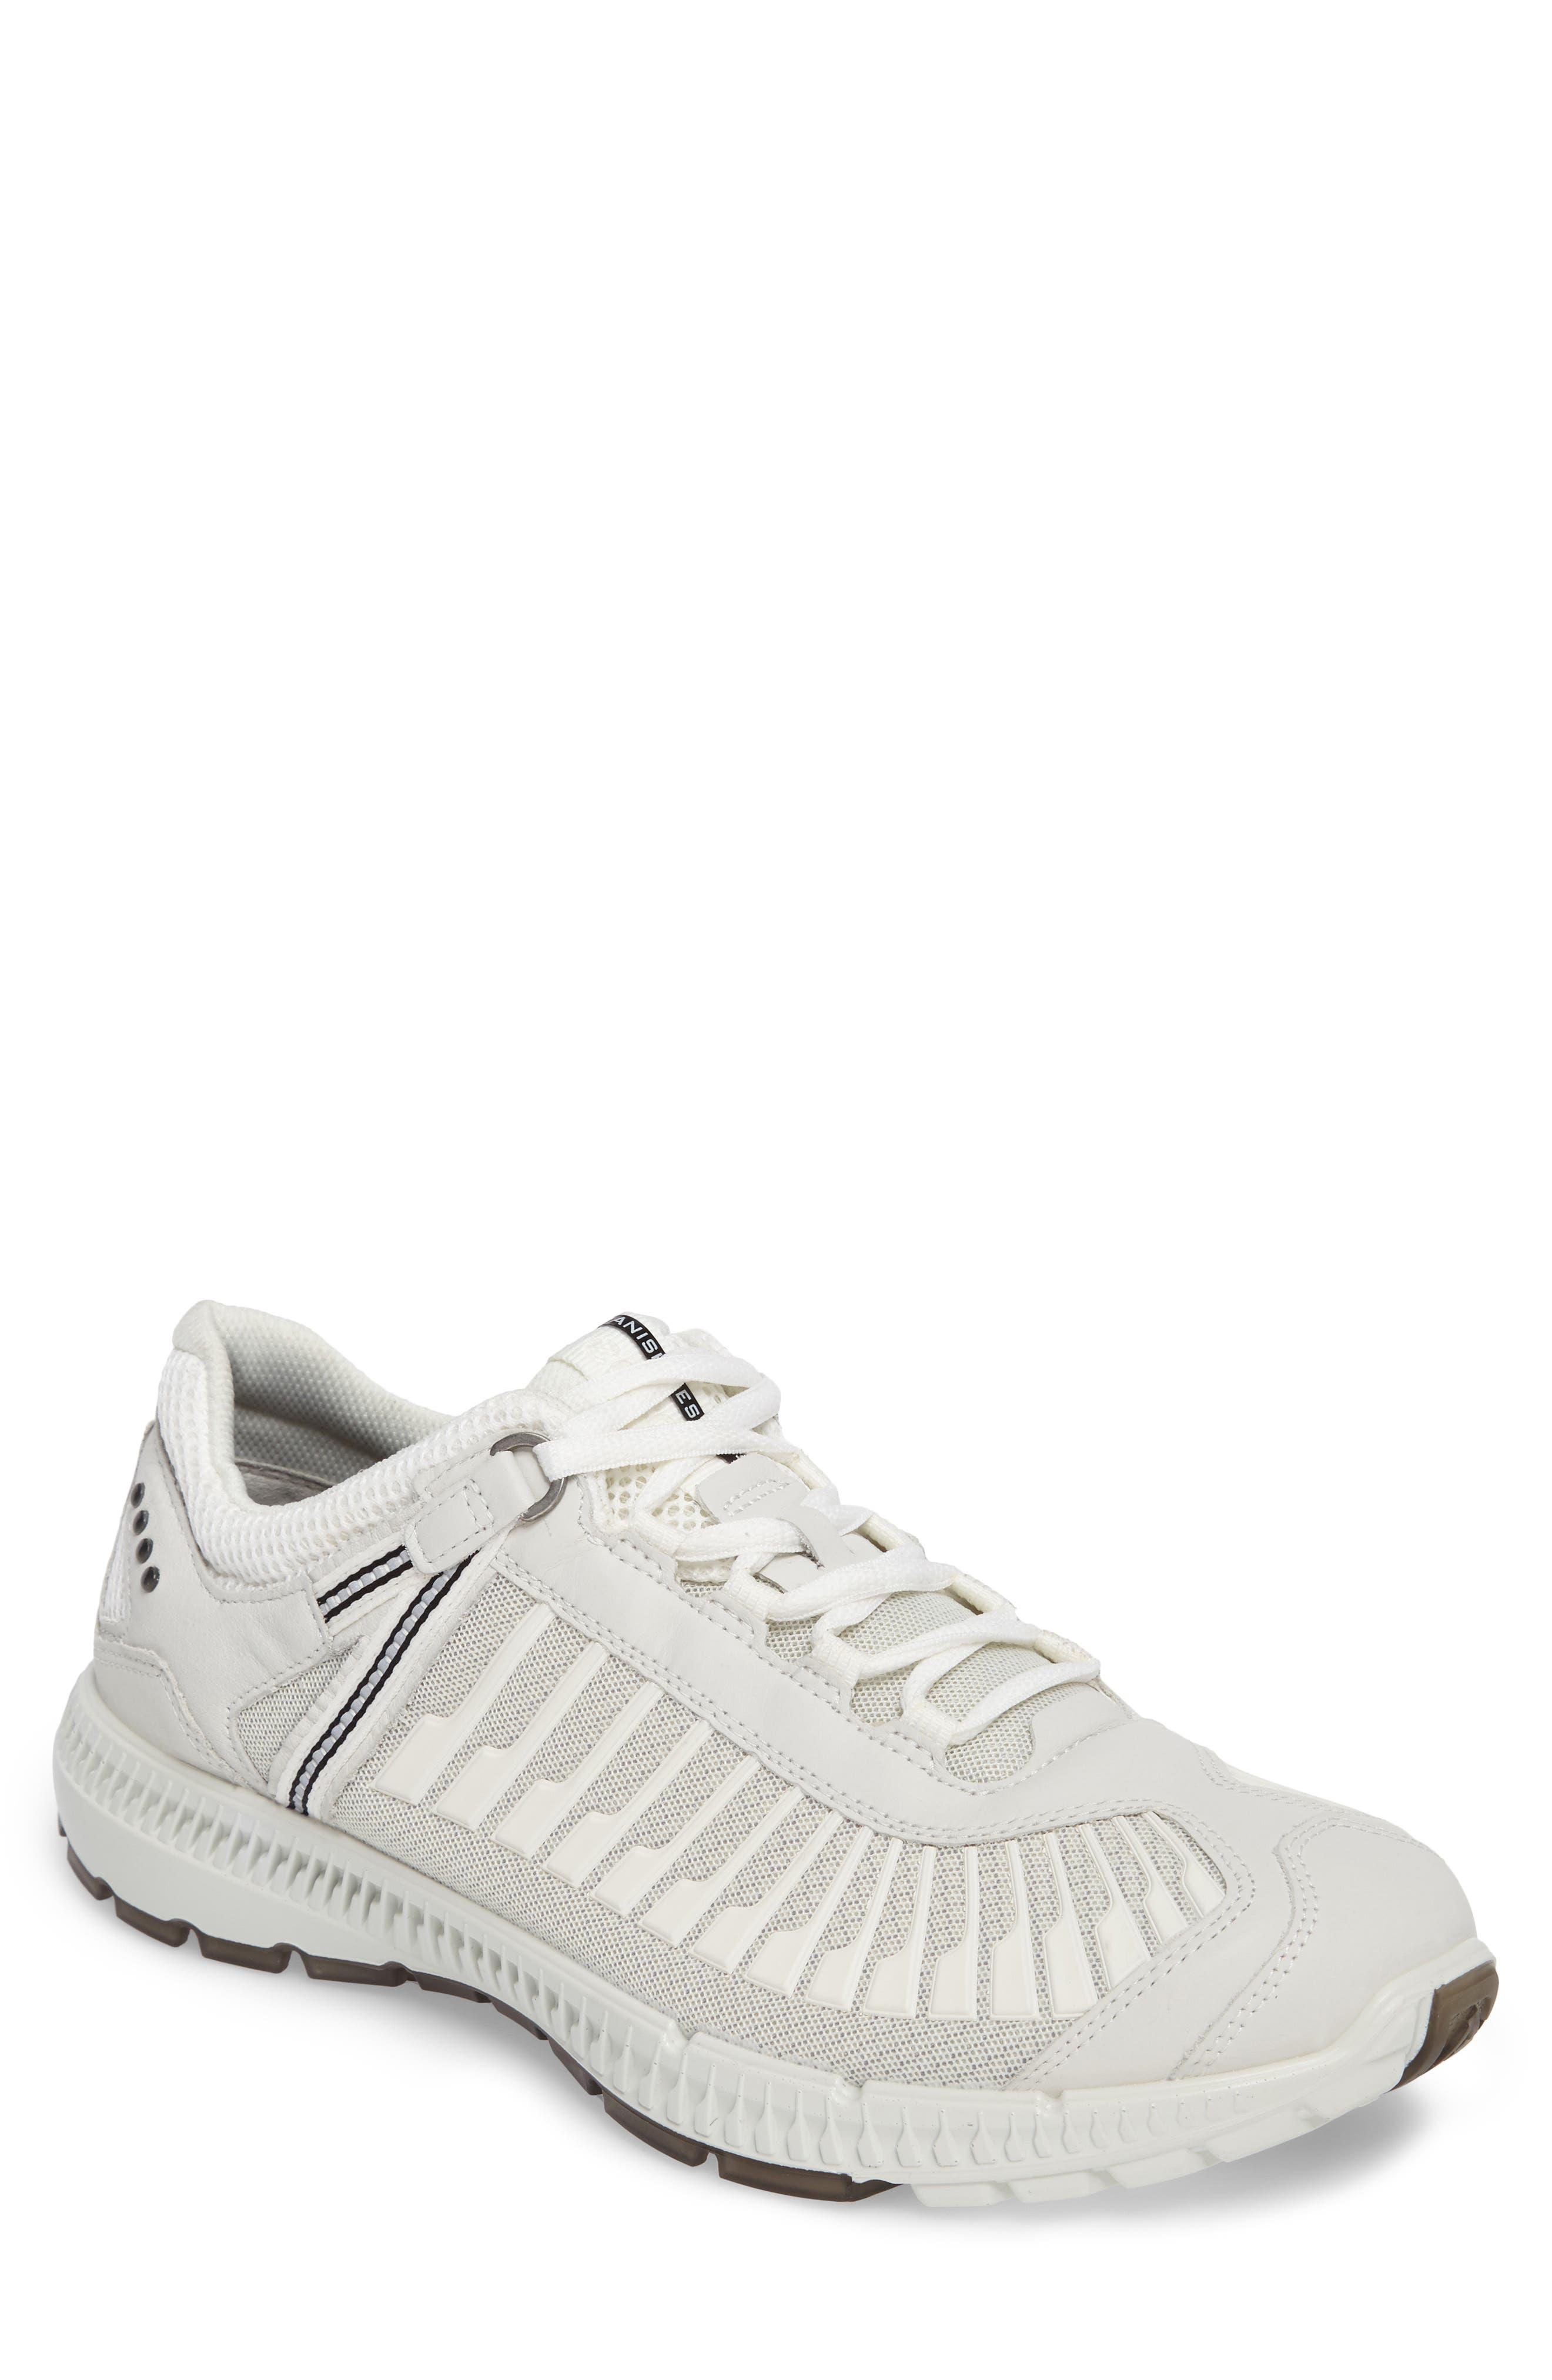 ECCO Intrinsic TR Run Sneaker (Men)